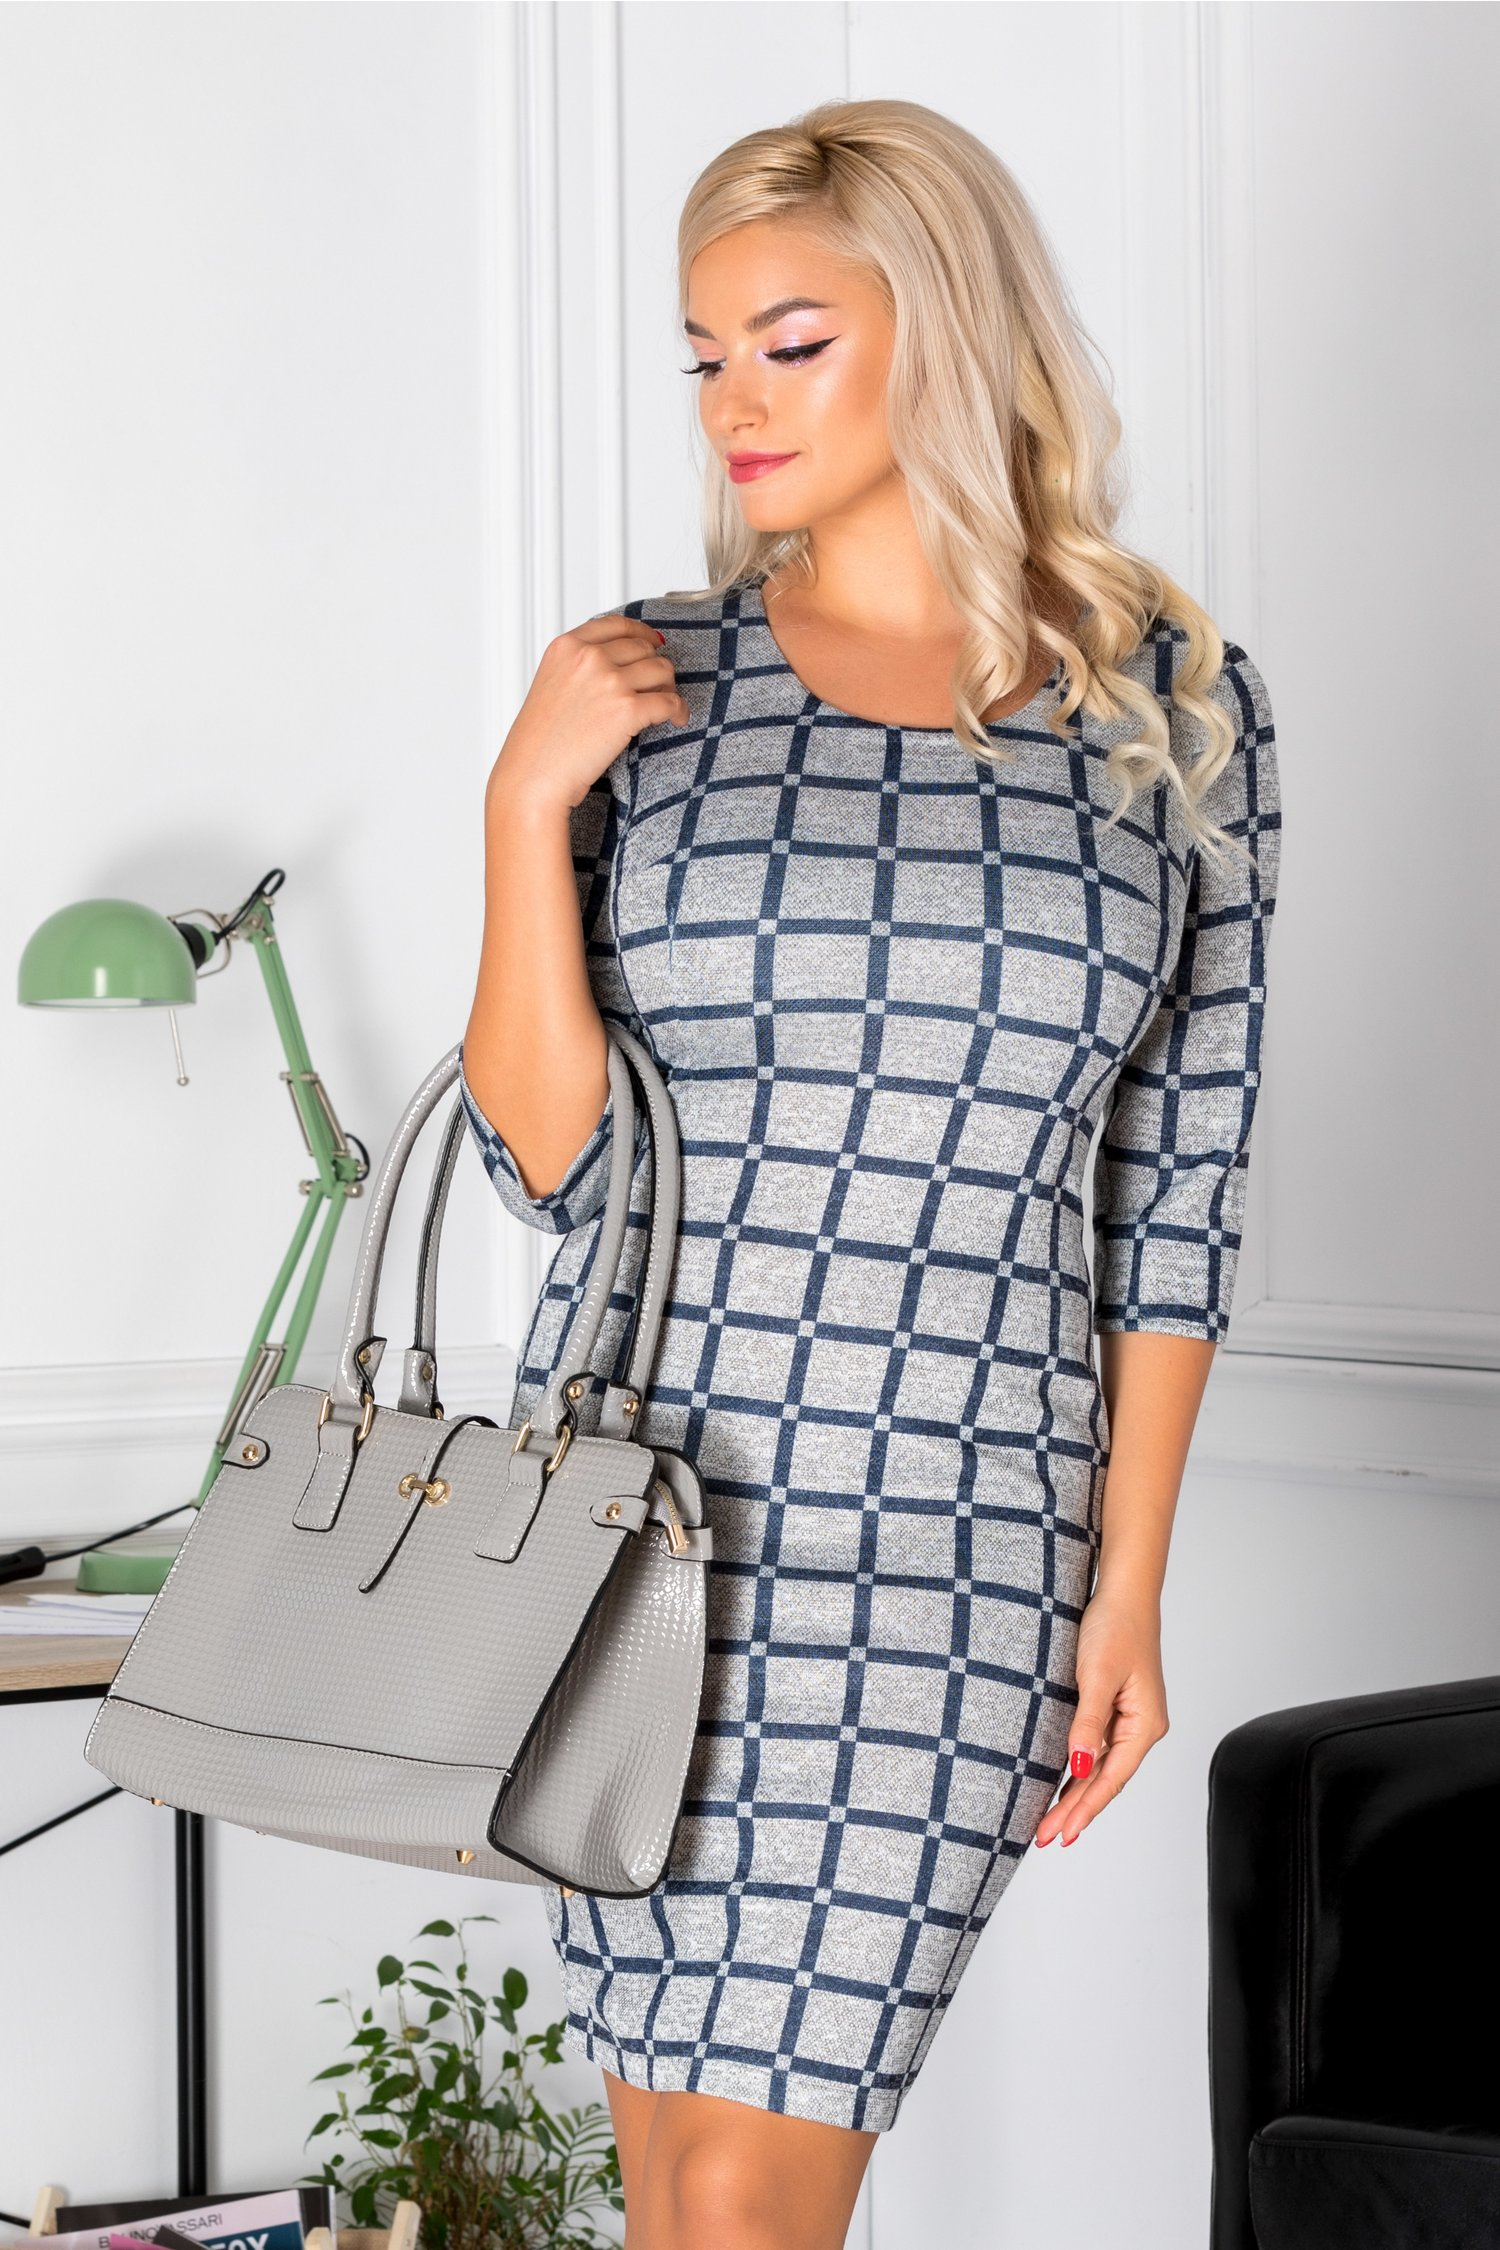 Magazin Online Haine - Rochie Alicya conica gri cu carouri bleumarin -Fashion-4u.Eu